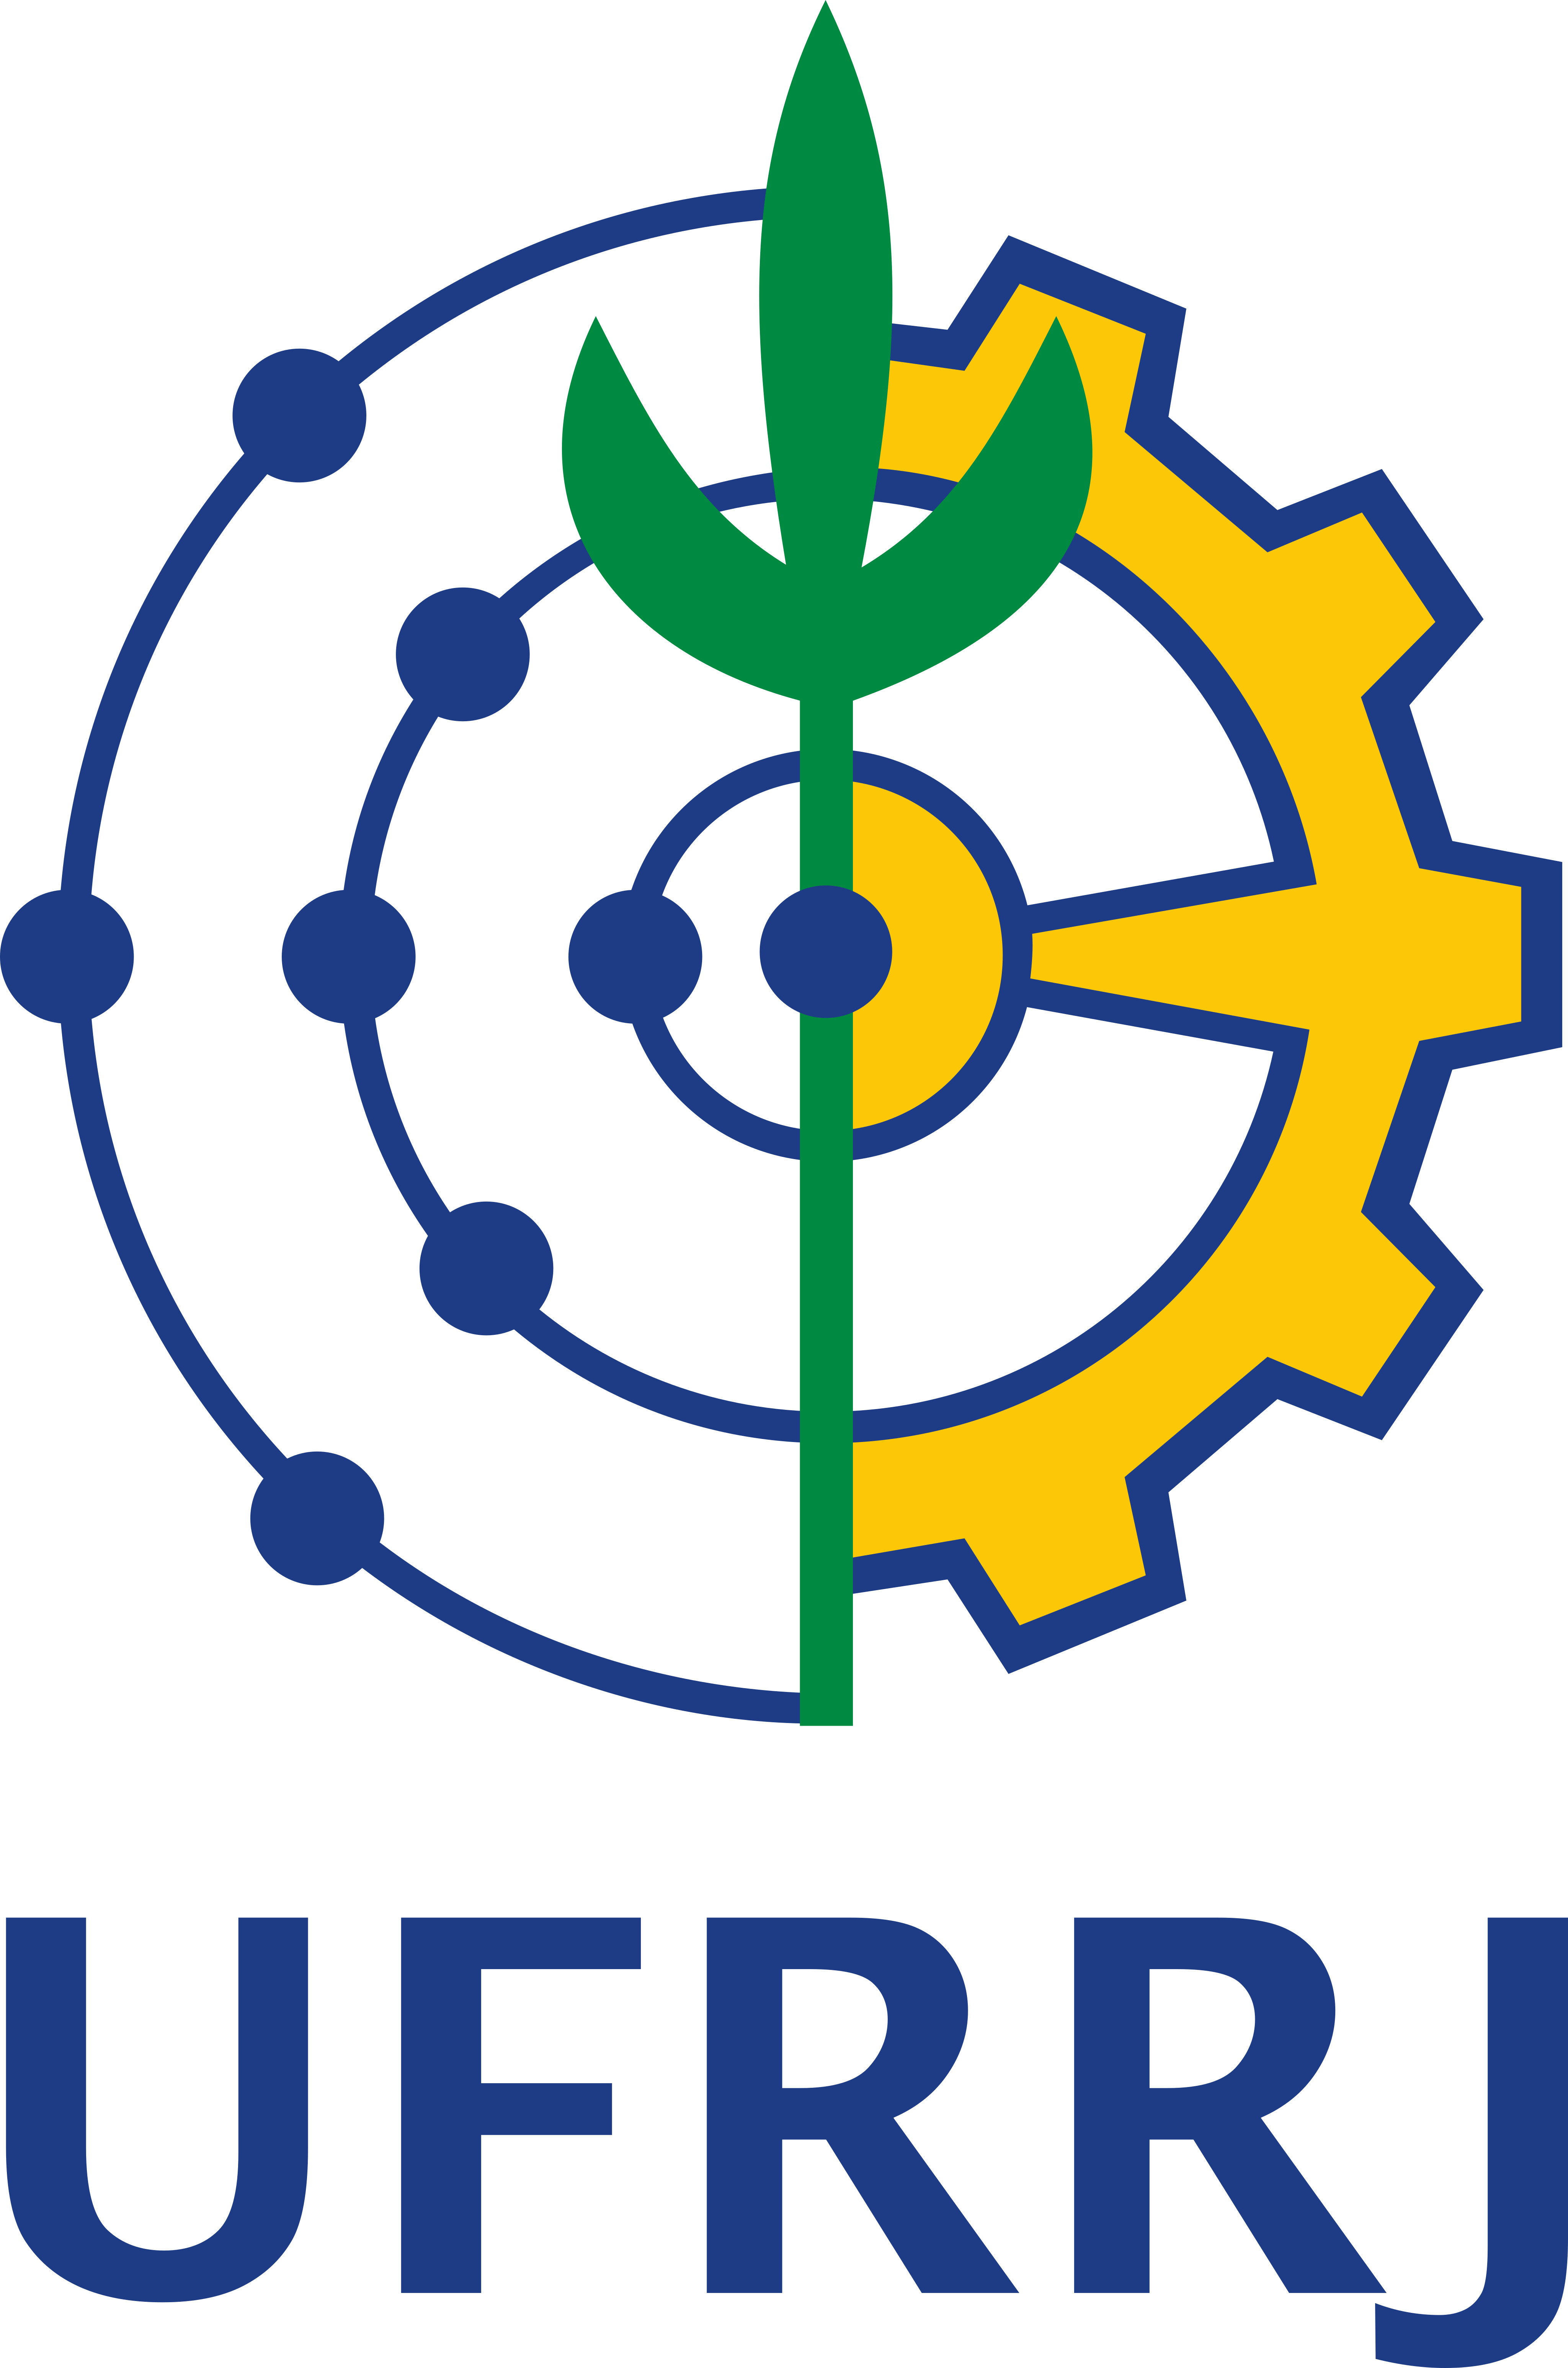 ufrrj logo - UFRRJ Logo